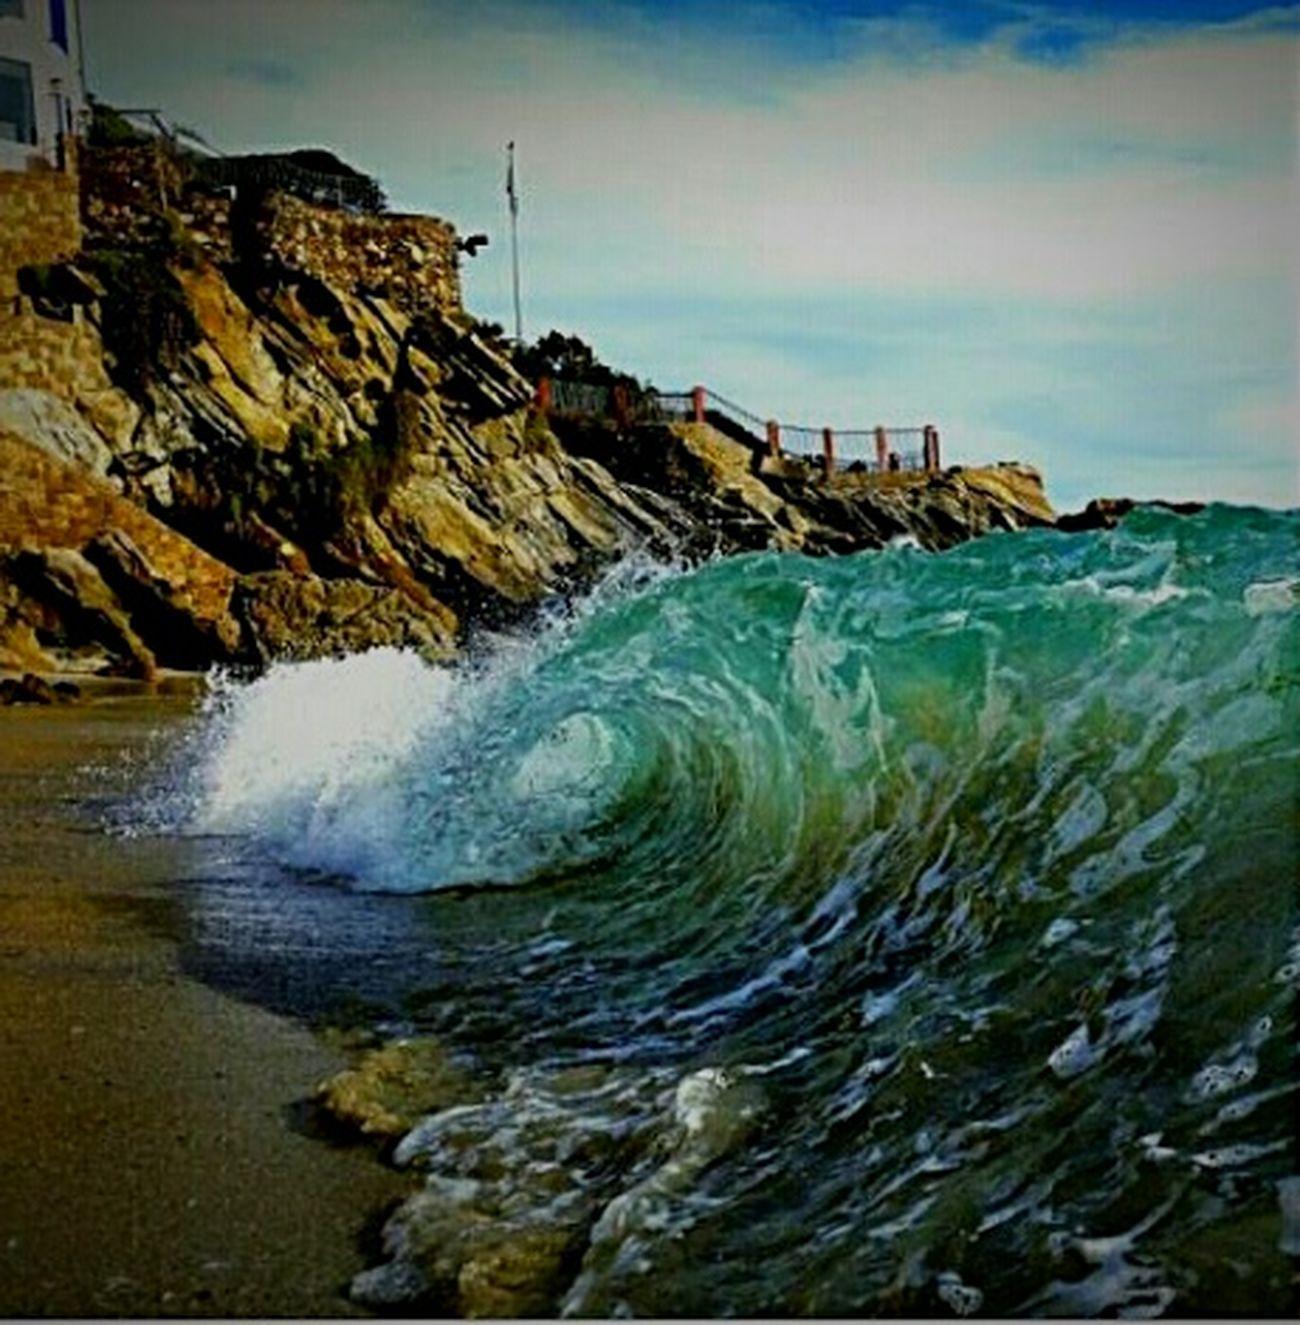 Beachphotography Waves Inthecurl Laguna Beach Woods Cove